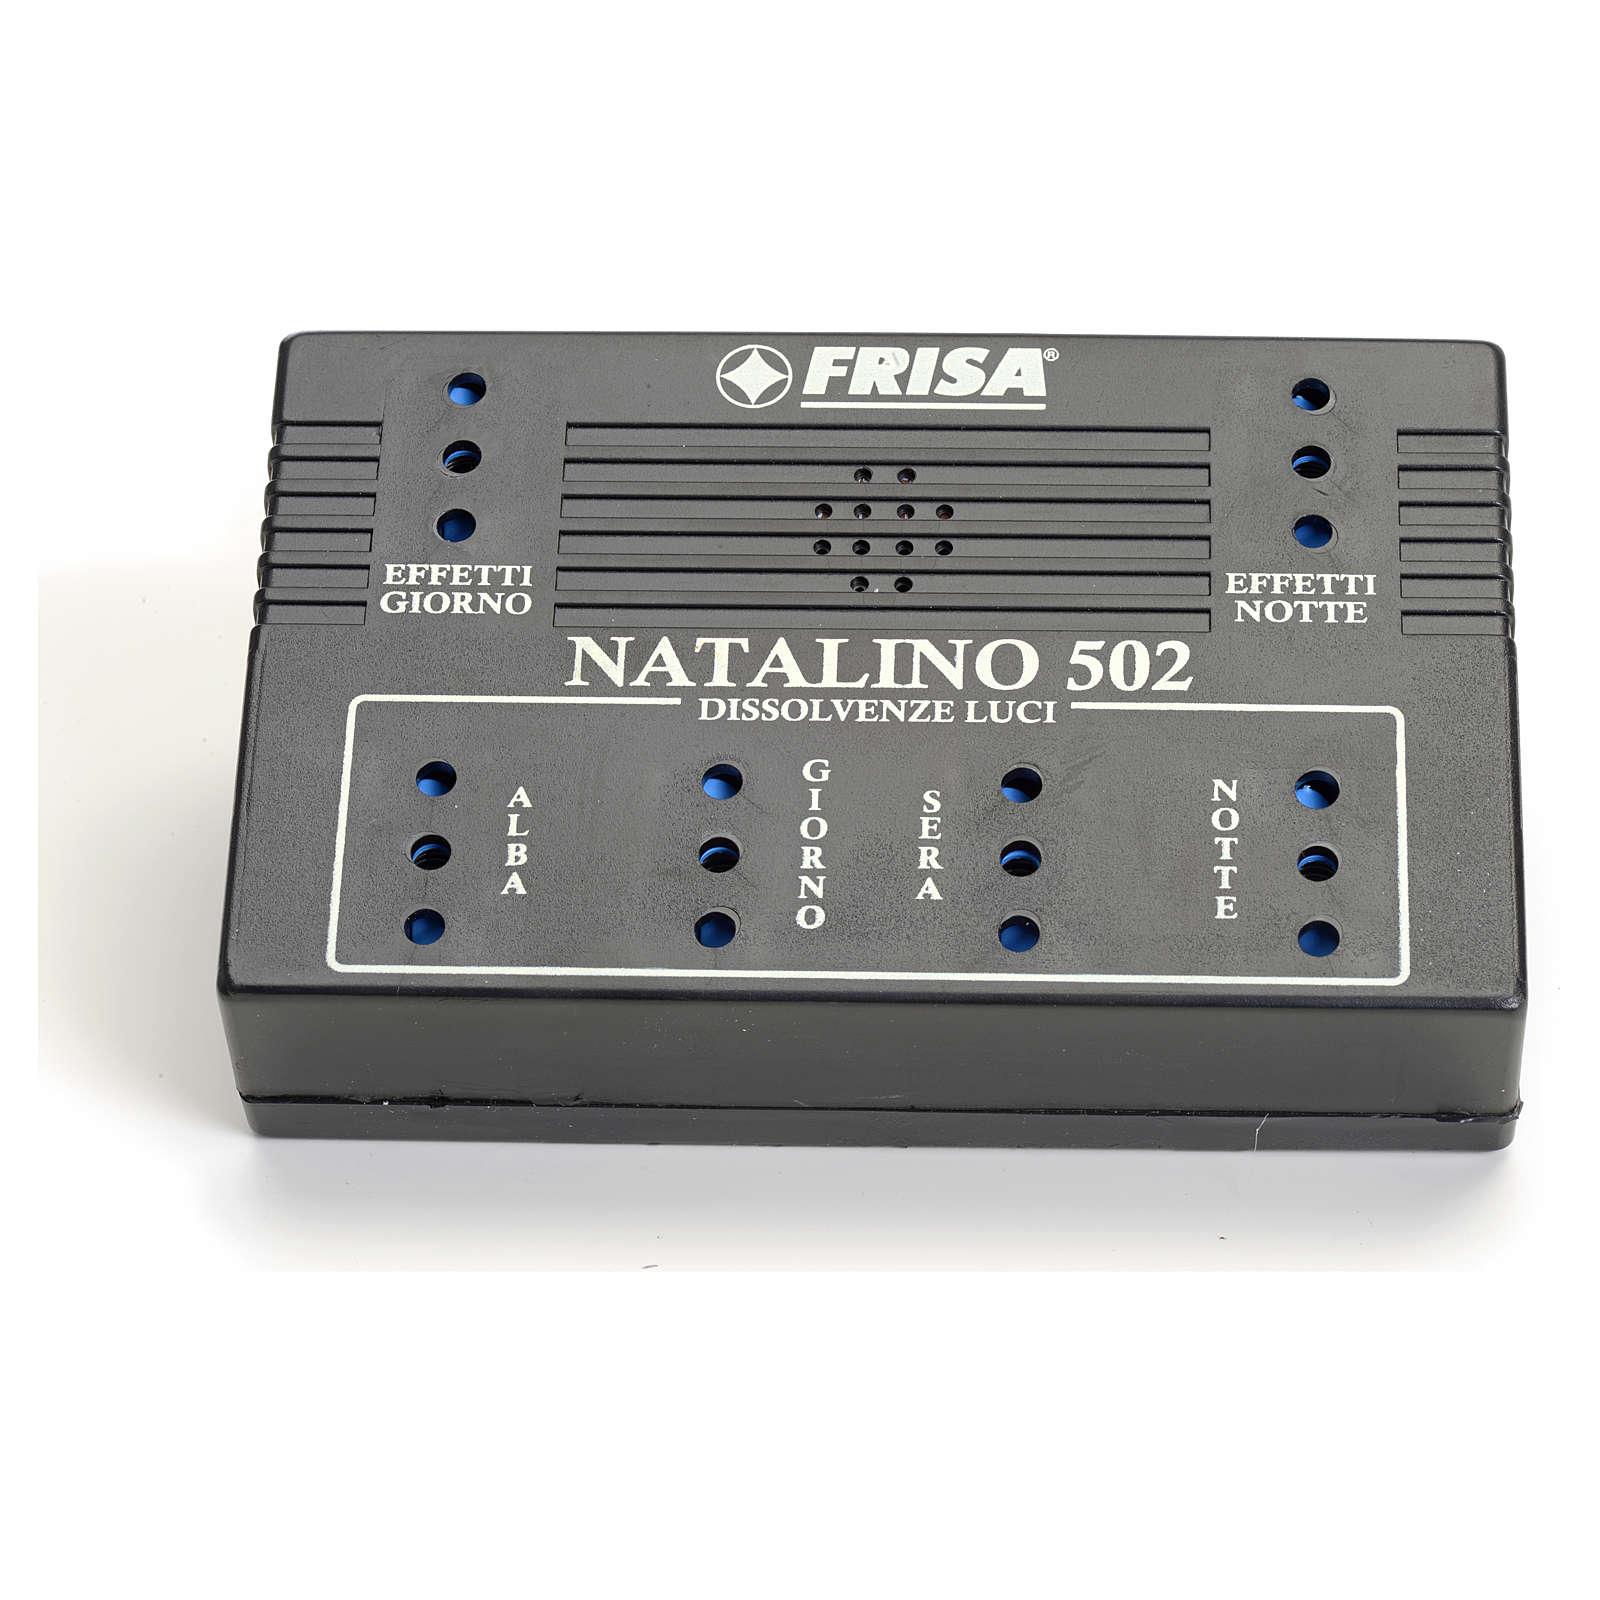 Natalino N502: centrale fondu jour et nuit 4